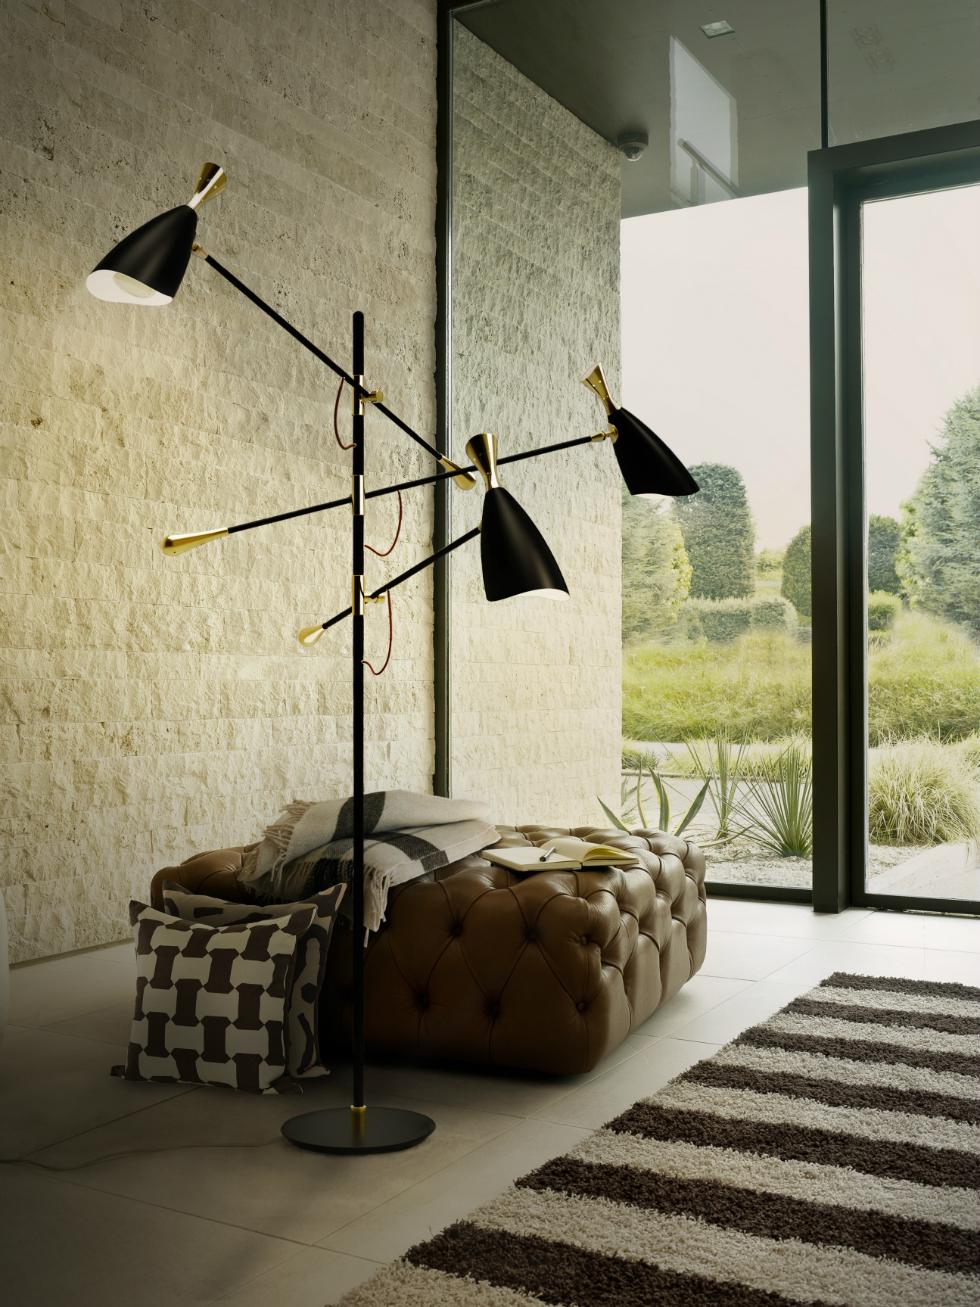 Lighting Ideas Mid-Century Lighting Ideas for the Master Bedroom Decor Feature3